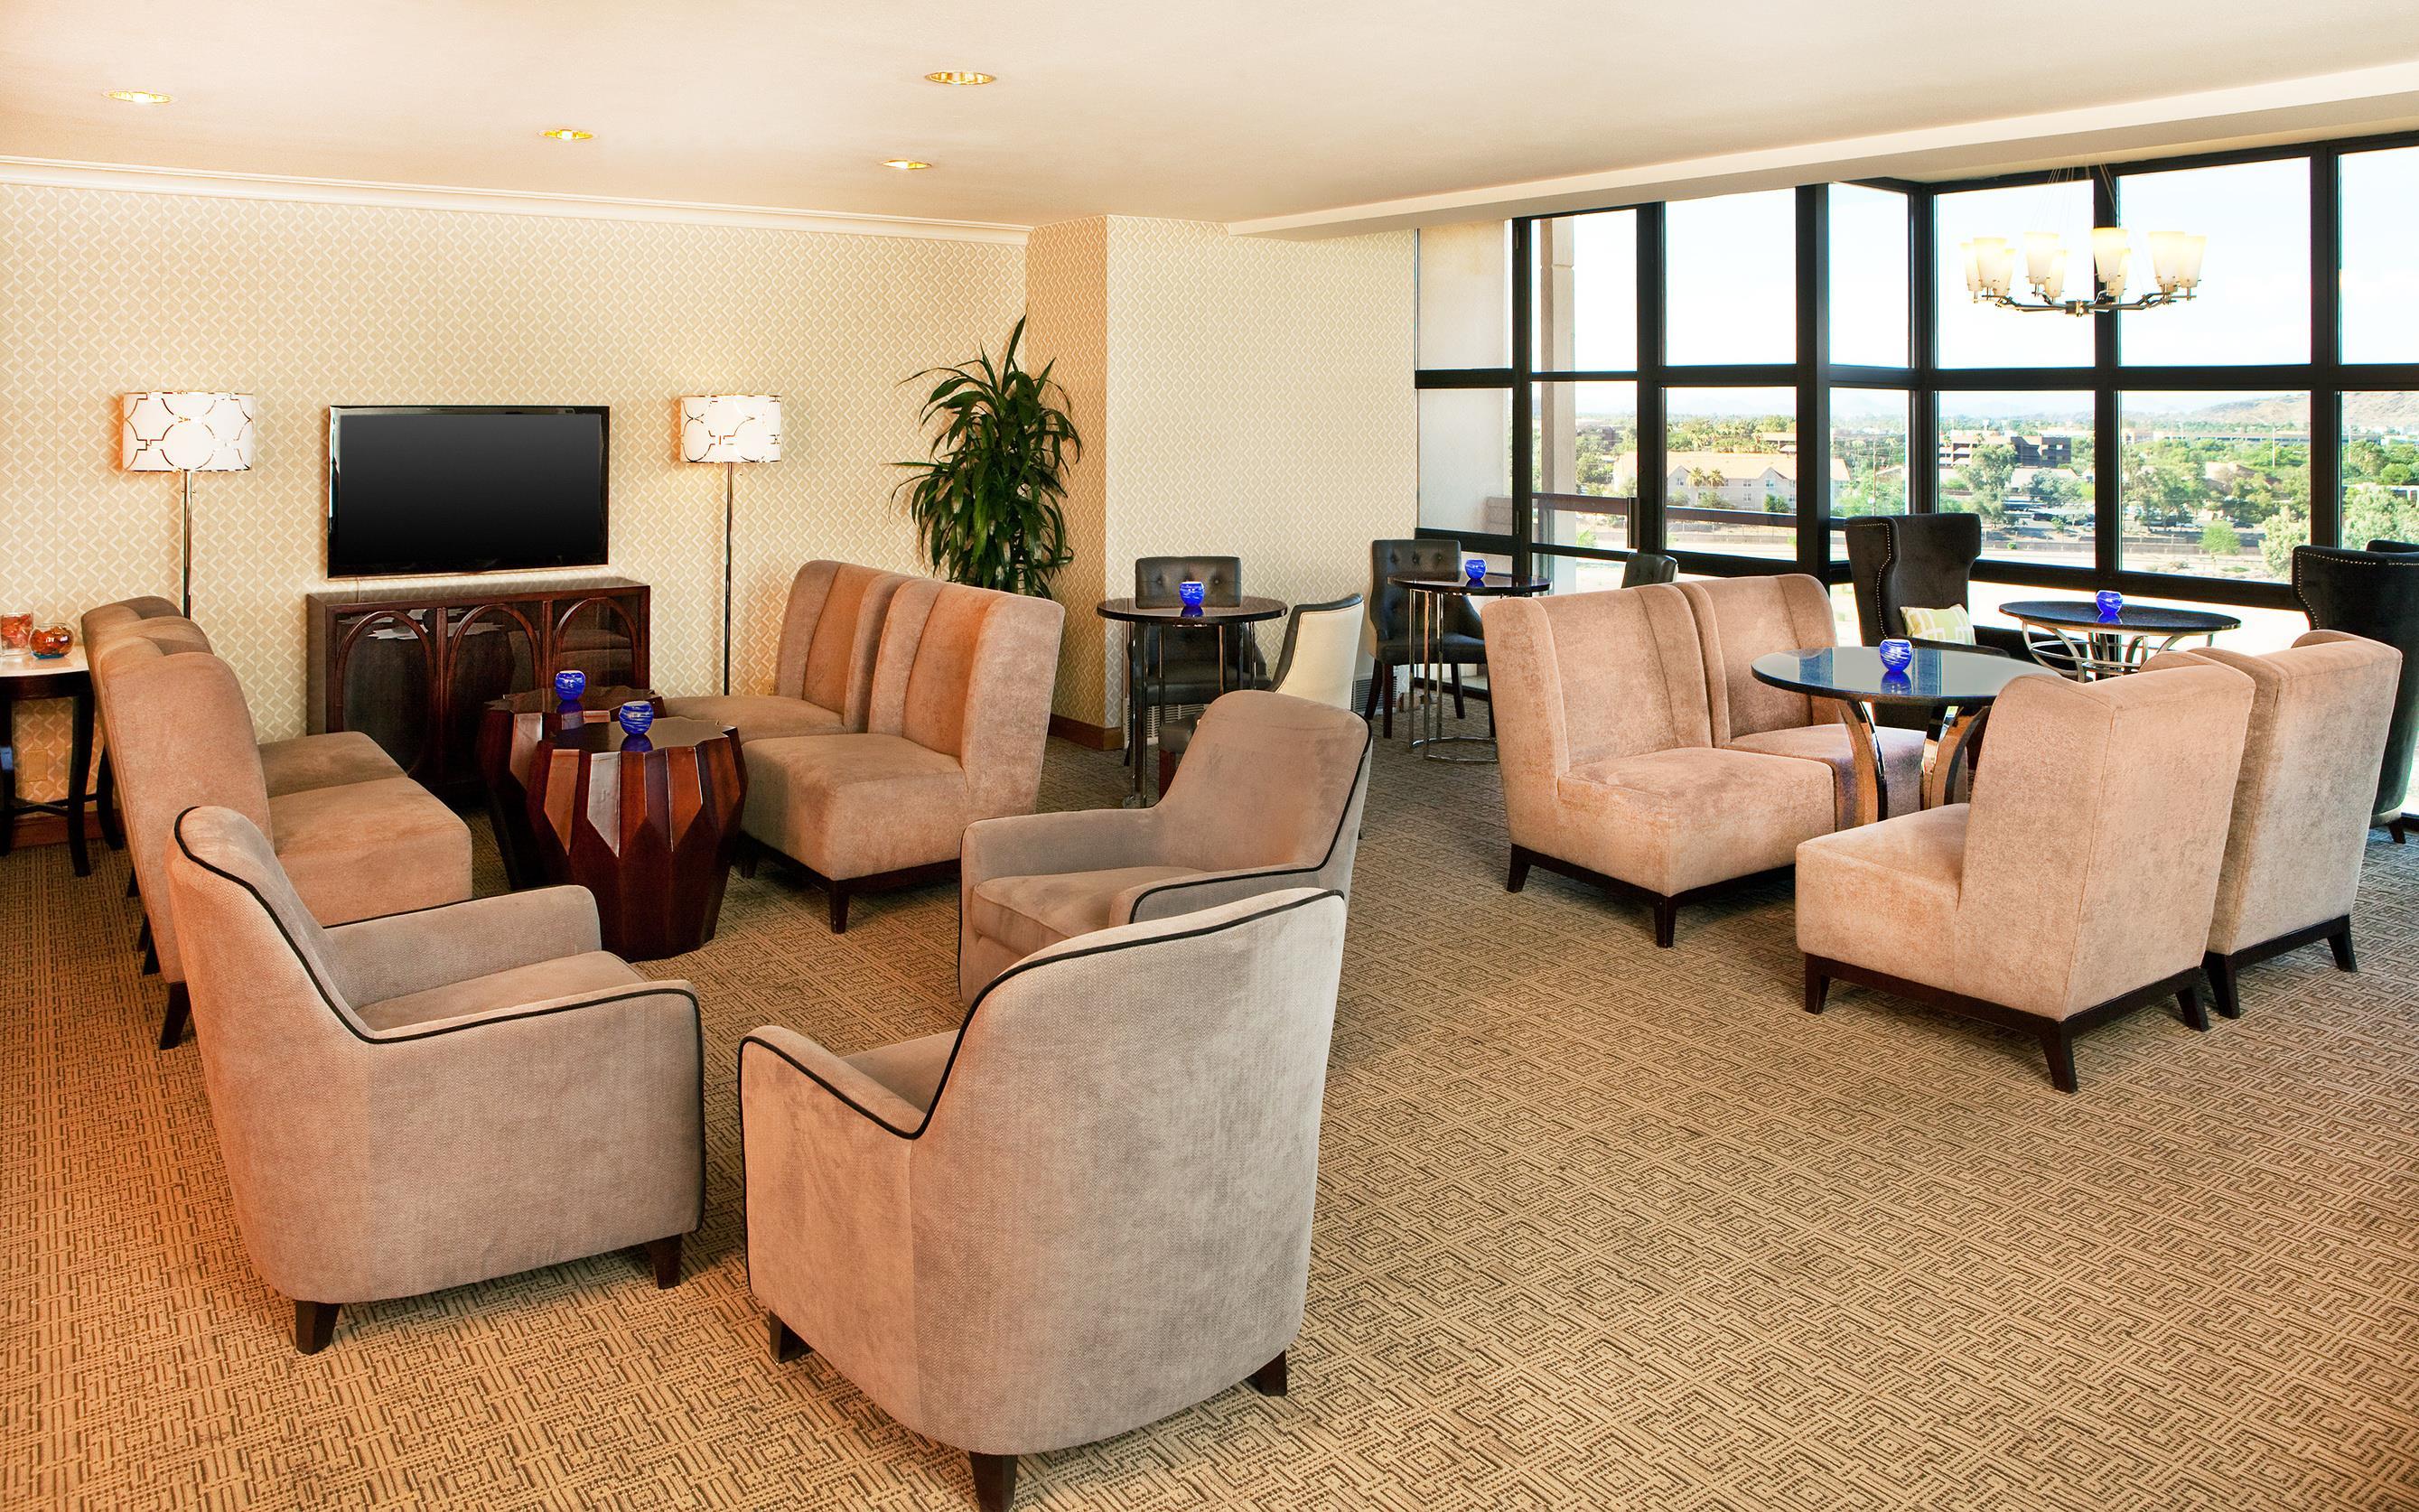 Sheraton Crescent Hotel image 27